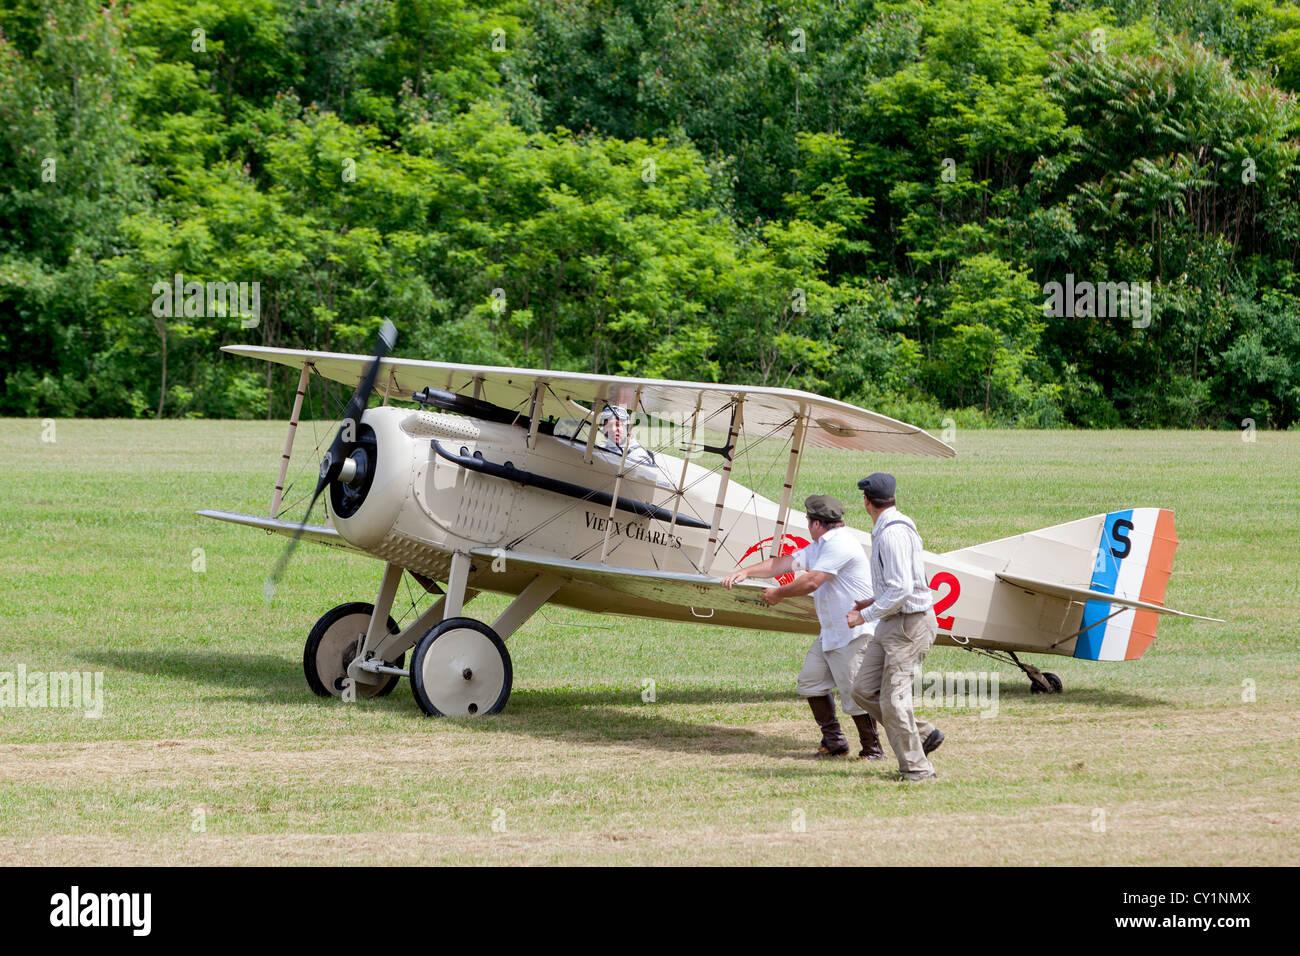 SPAD VII antique biplane. - Stock Image